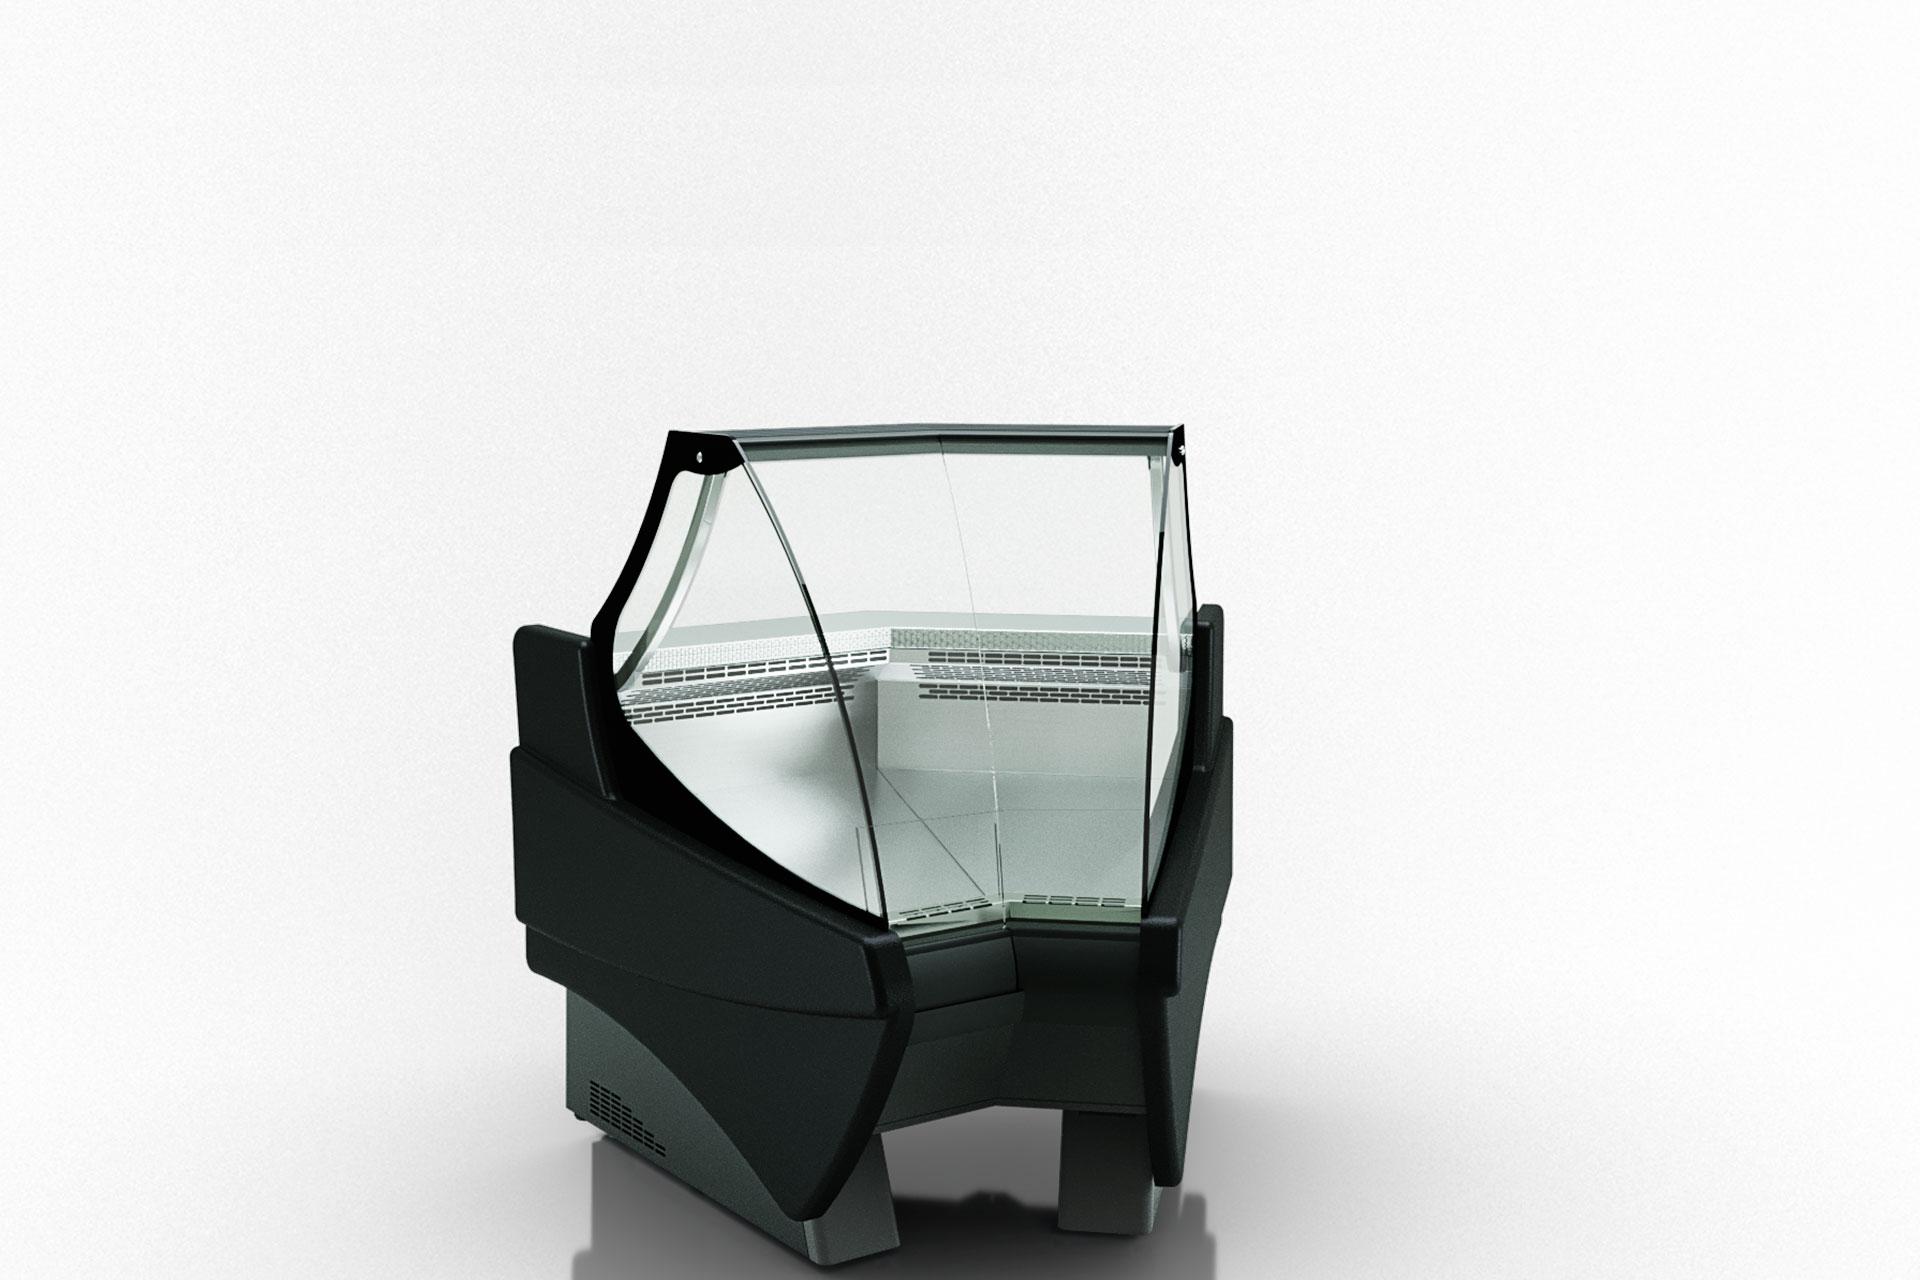 Kühlvitrinen Symphony luxe MG 120 deli PS 125-DLM-IS45